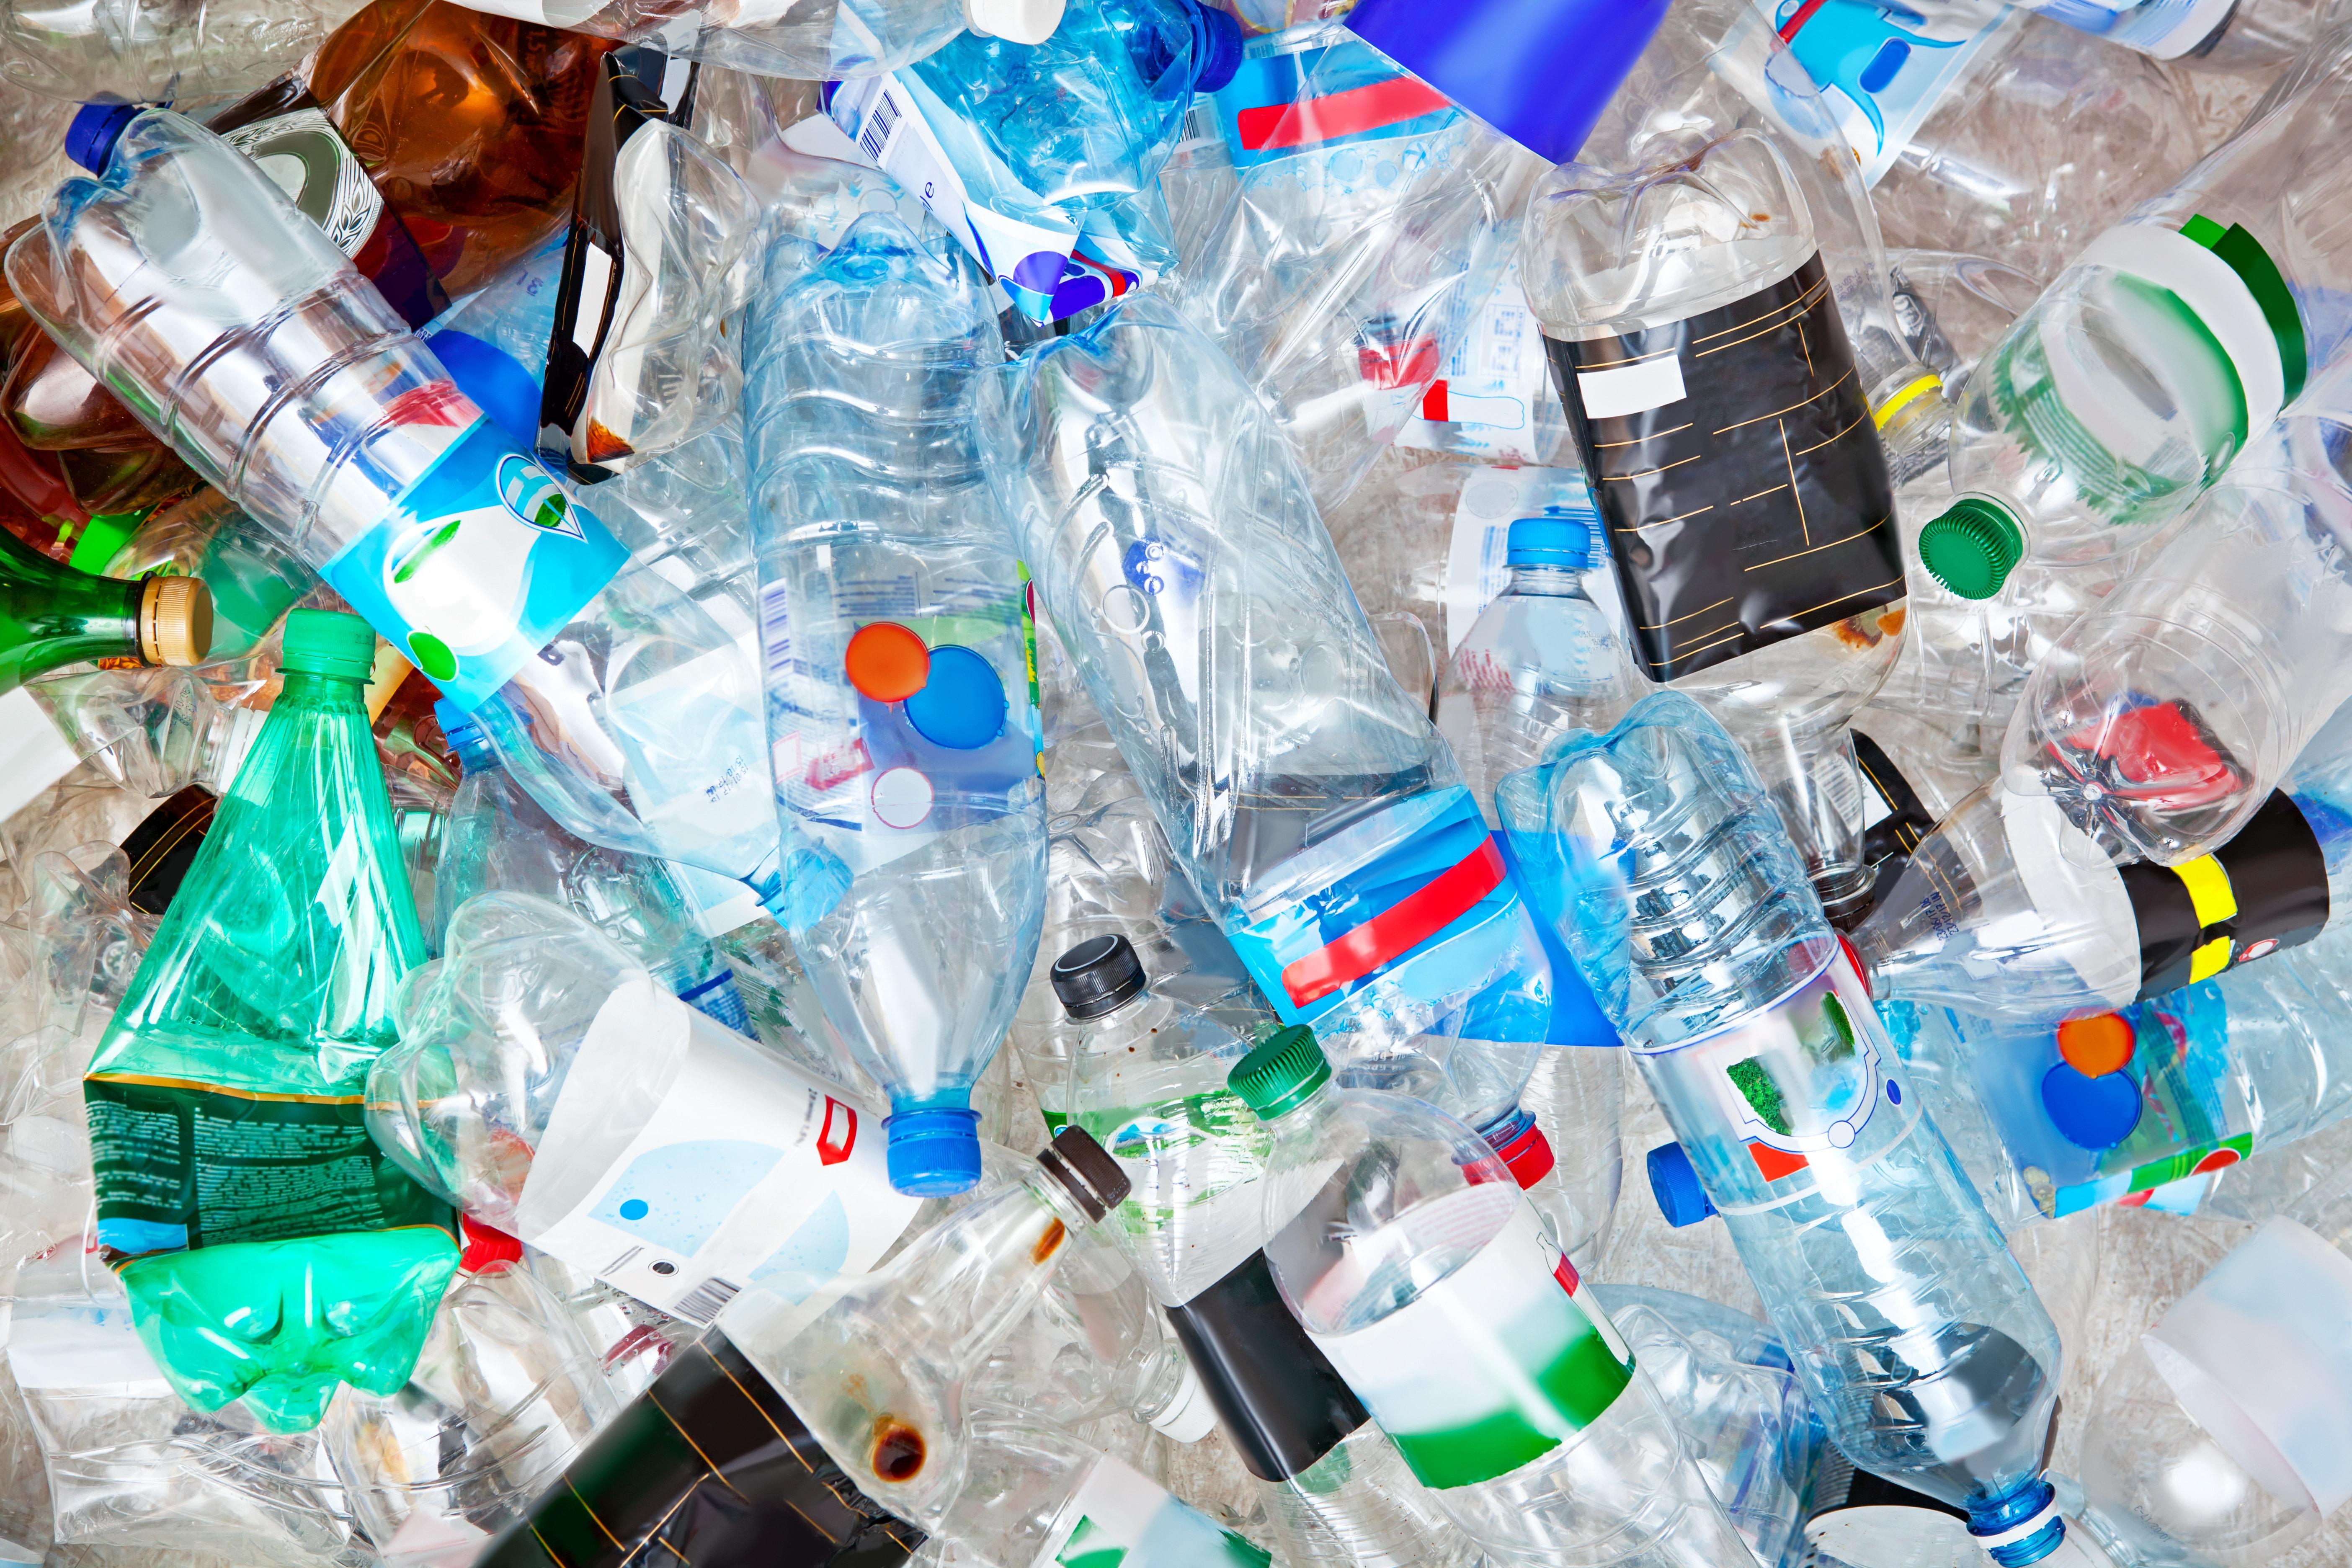 Big pile of empty plastic bottles.